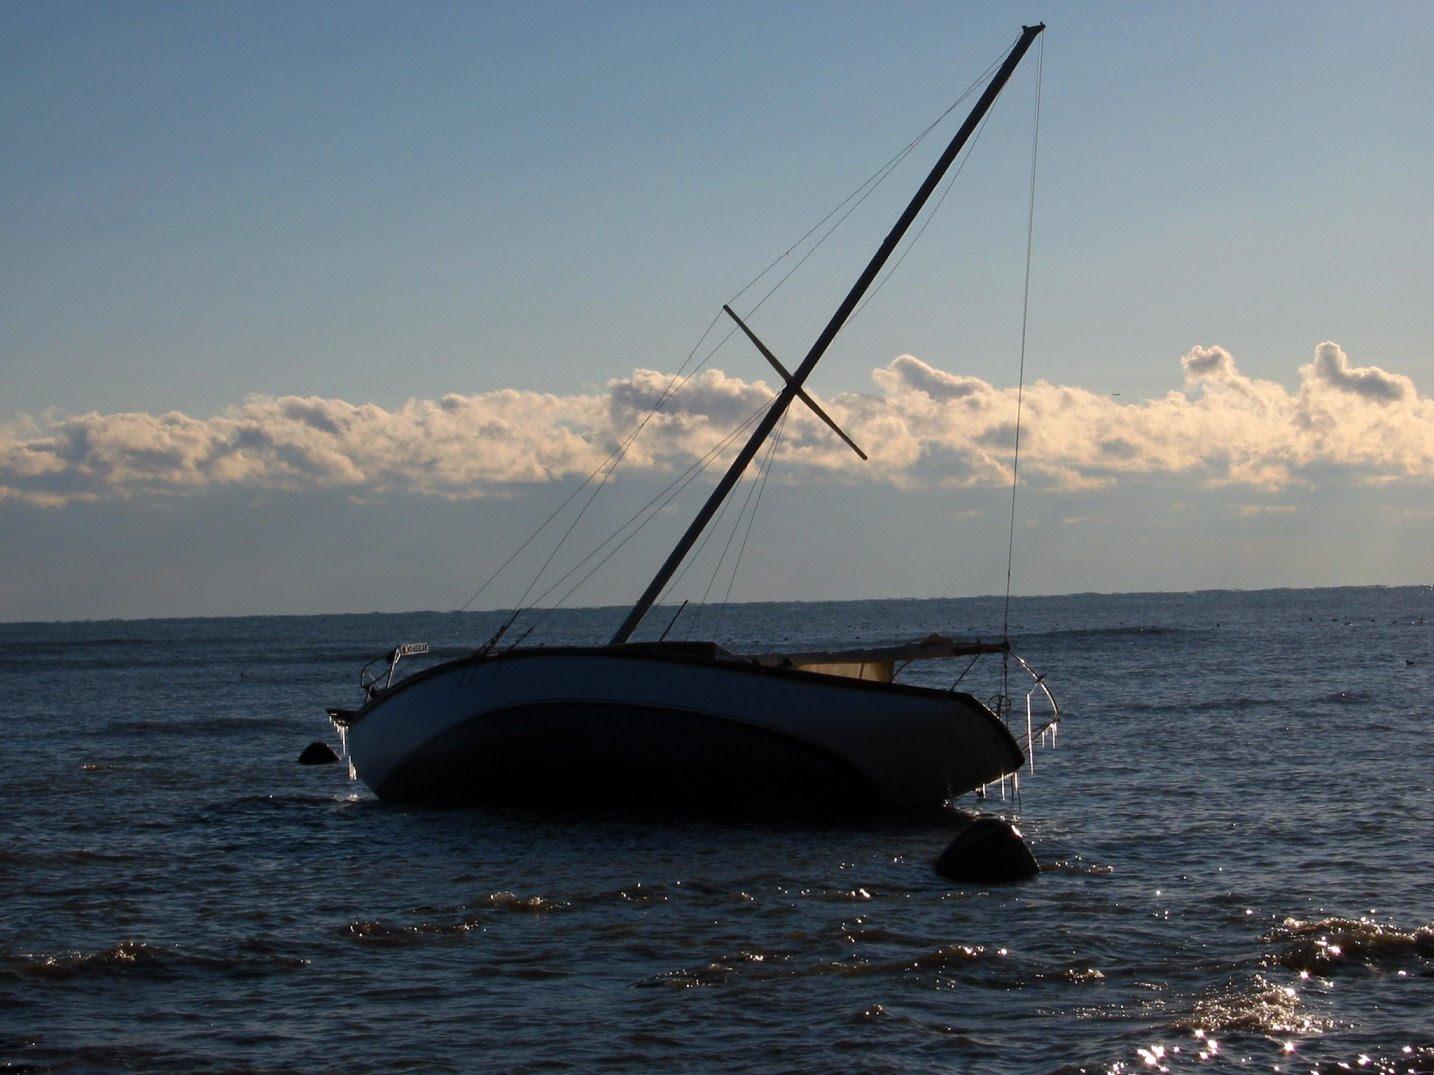 Stranded sailboat above Bradford Beach, in Lake Michigan, Milwaukee, WI - 11-23-2007 - soul-amp.com